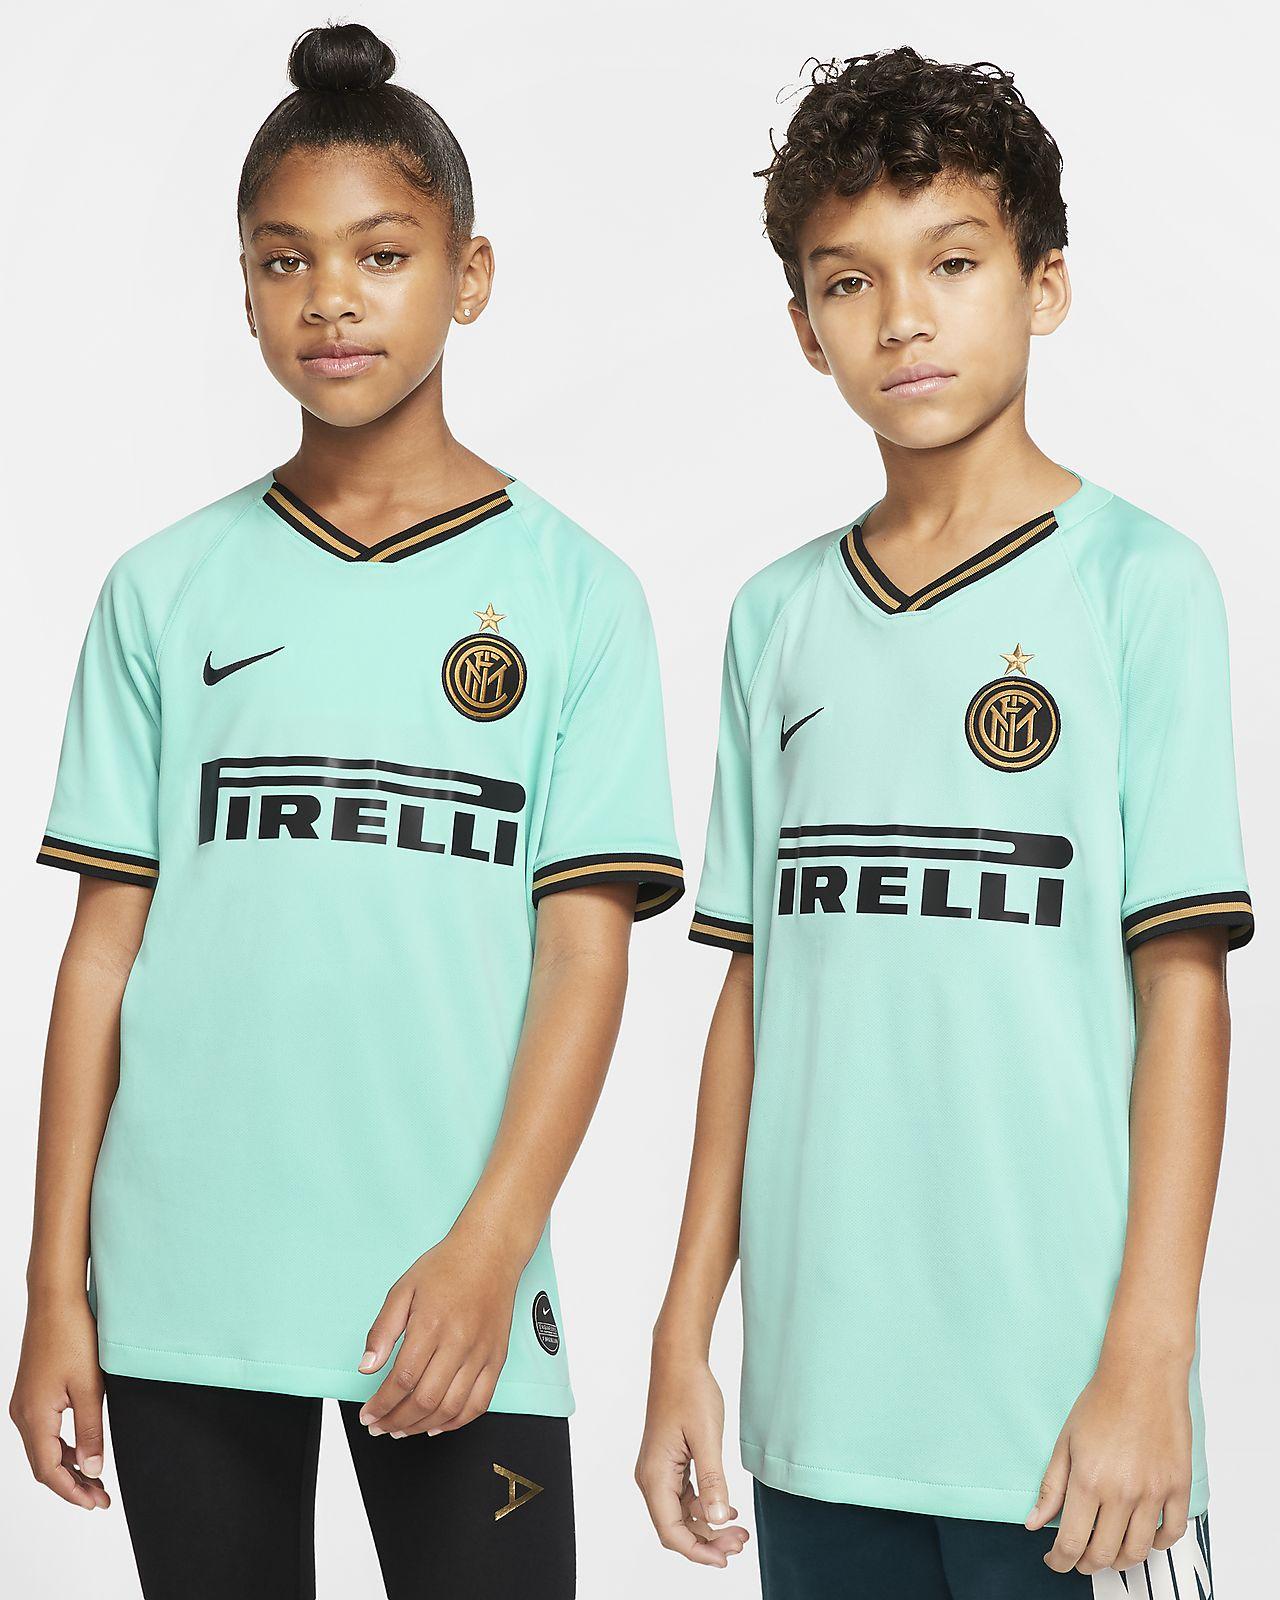 Inter Mailand 2019/20 Stadium Away Fußballtrikot für ältere Kinder